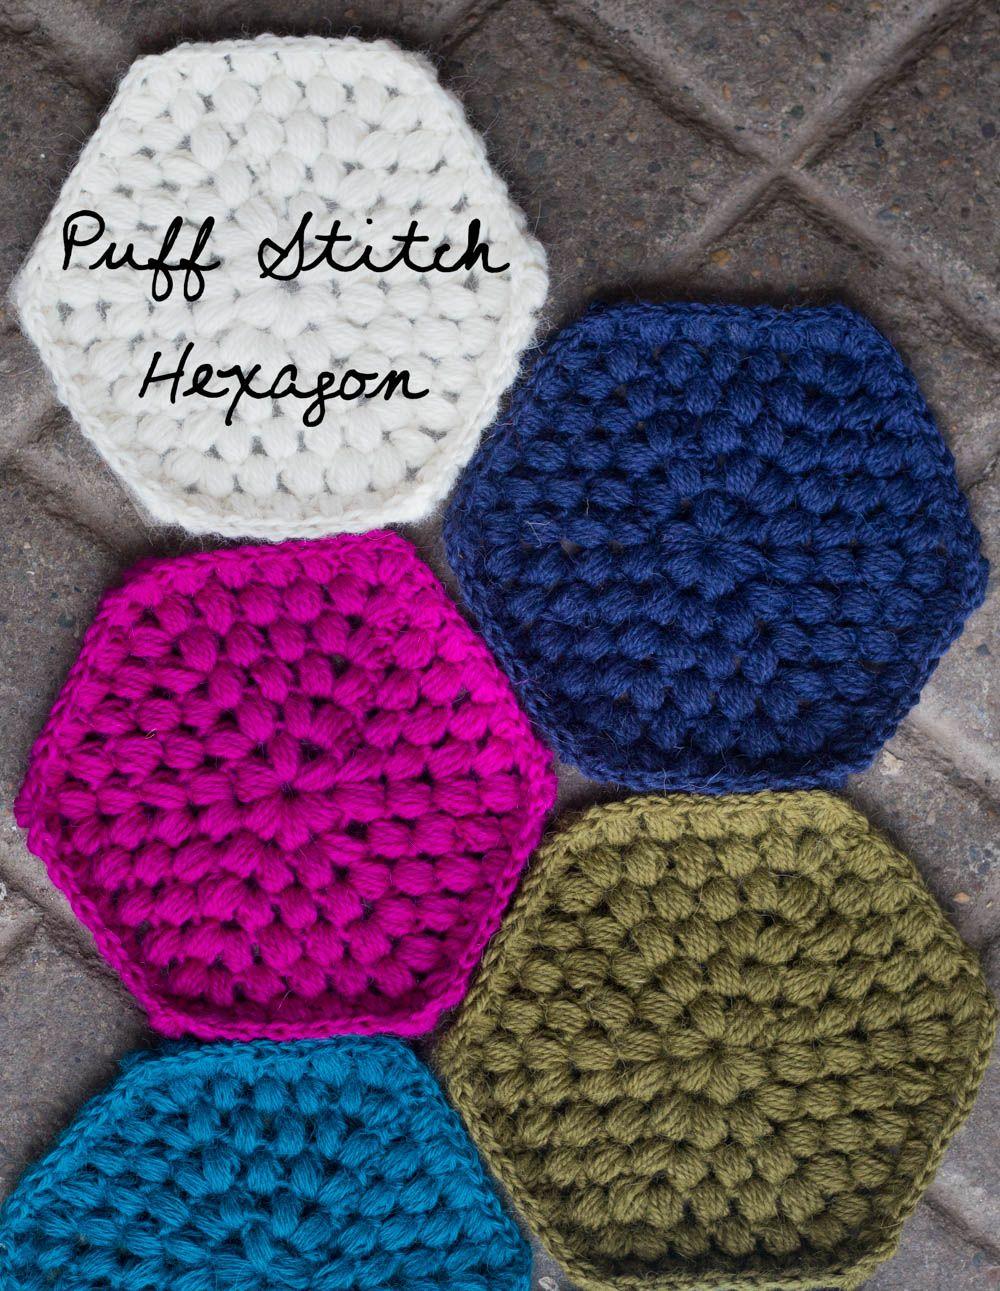 Weekend makes puff stitch hexy stitch crochet and tutorials crochet stitches dt1010fo